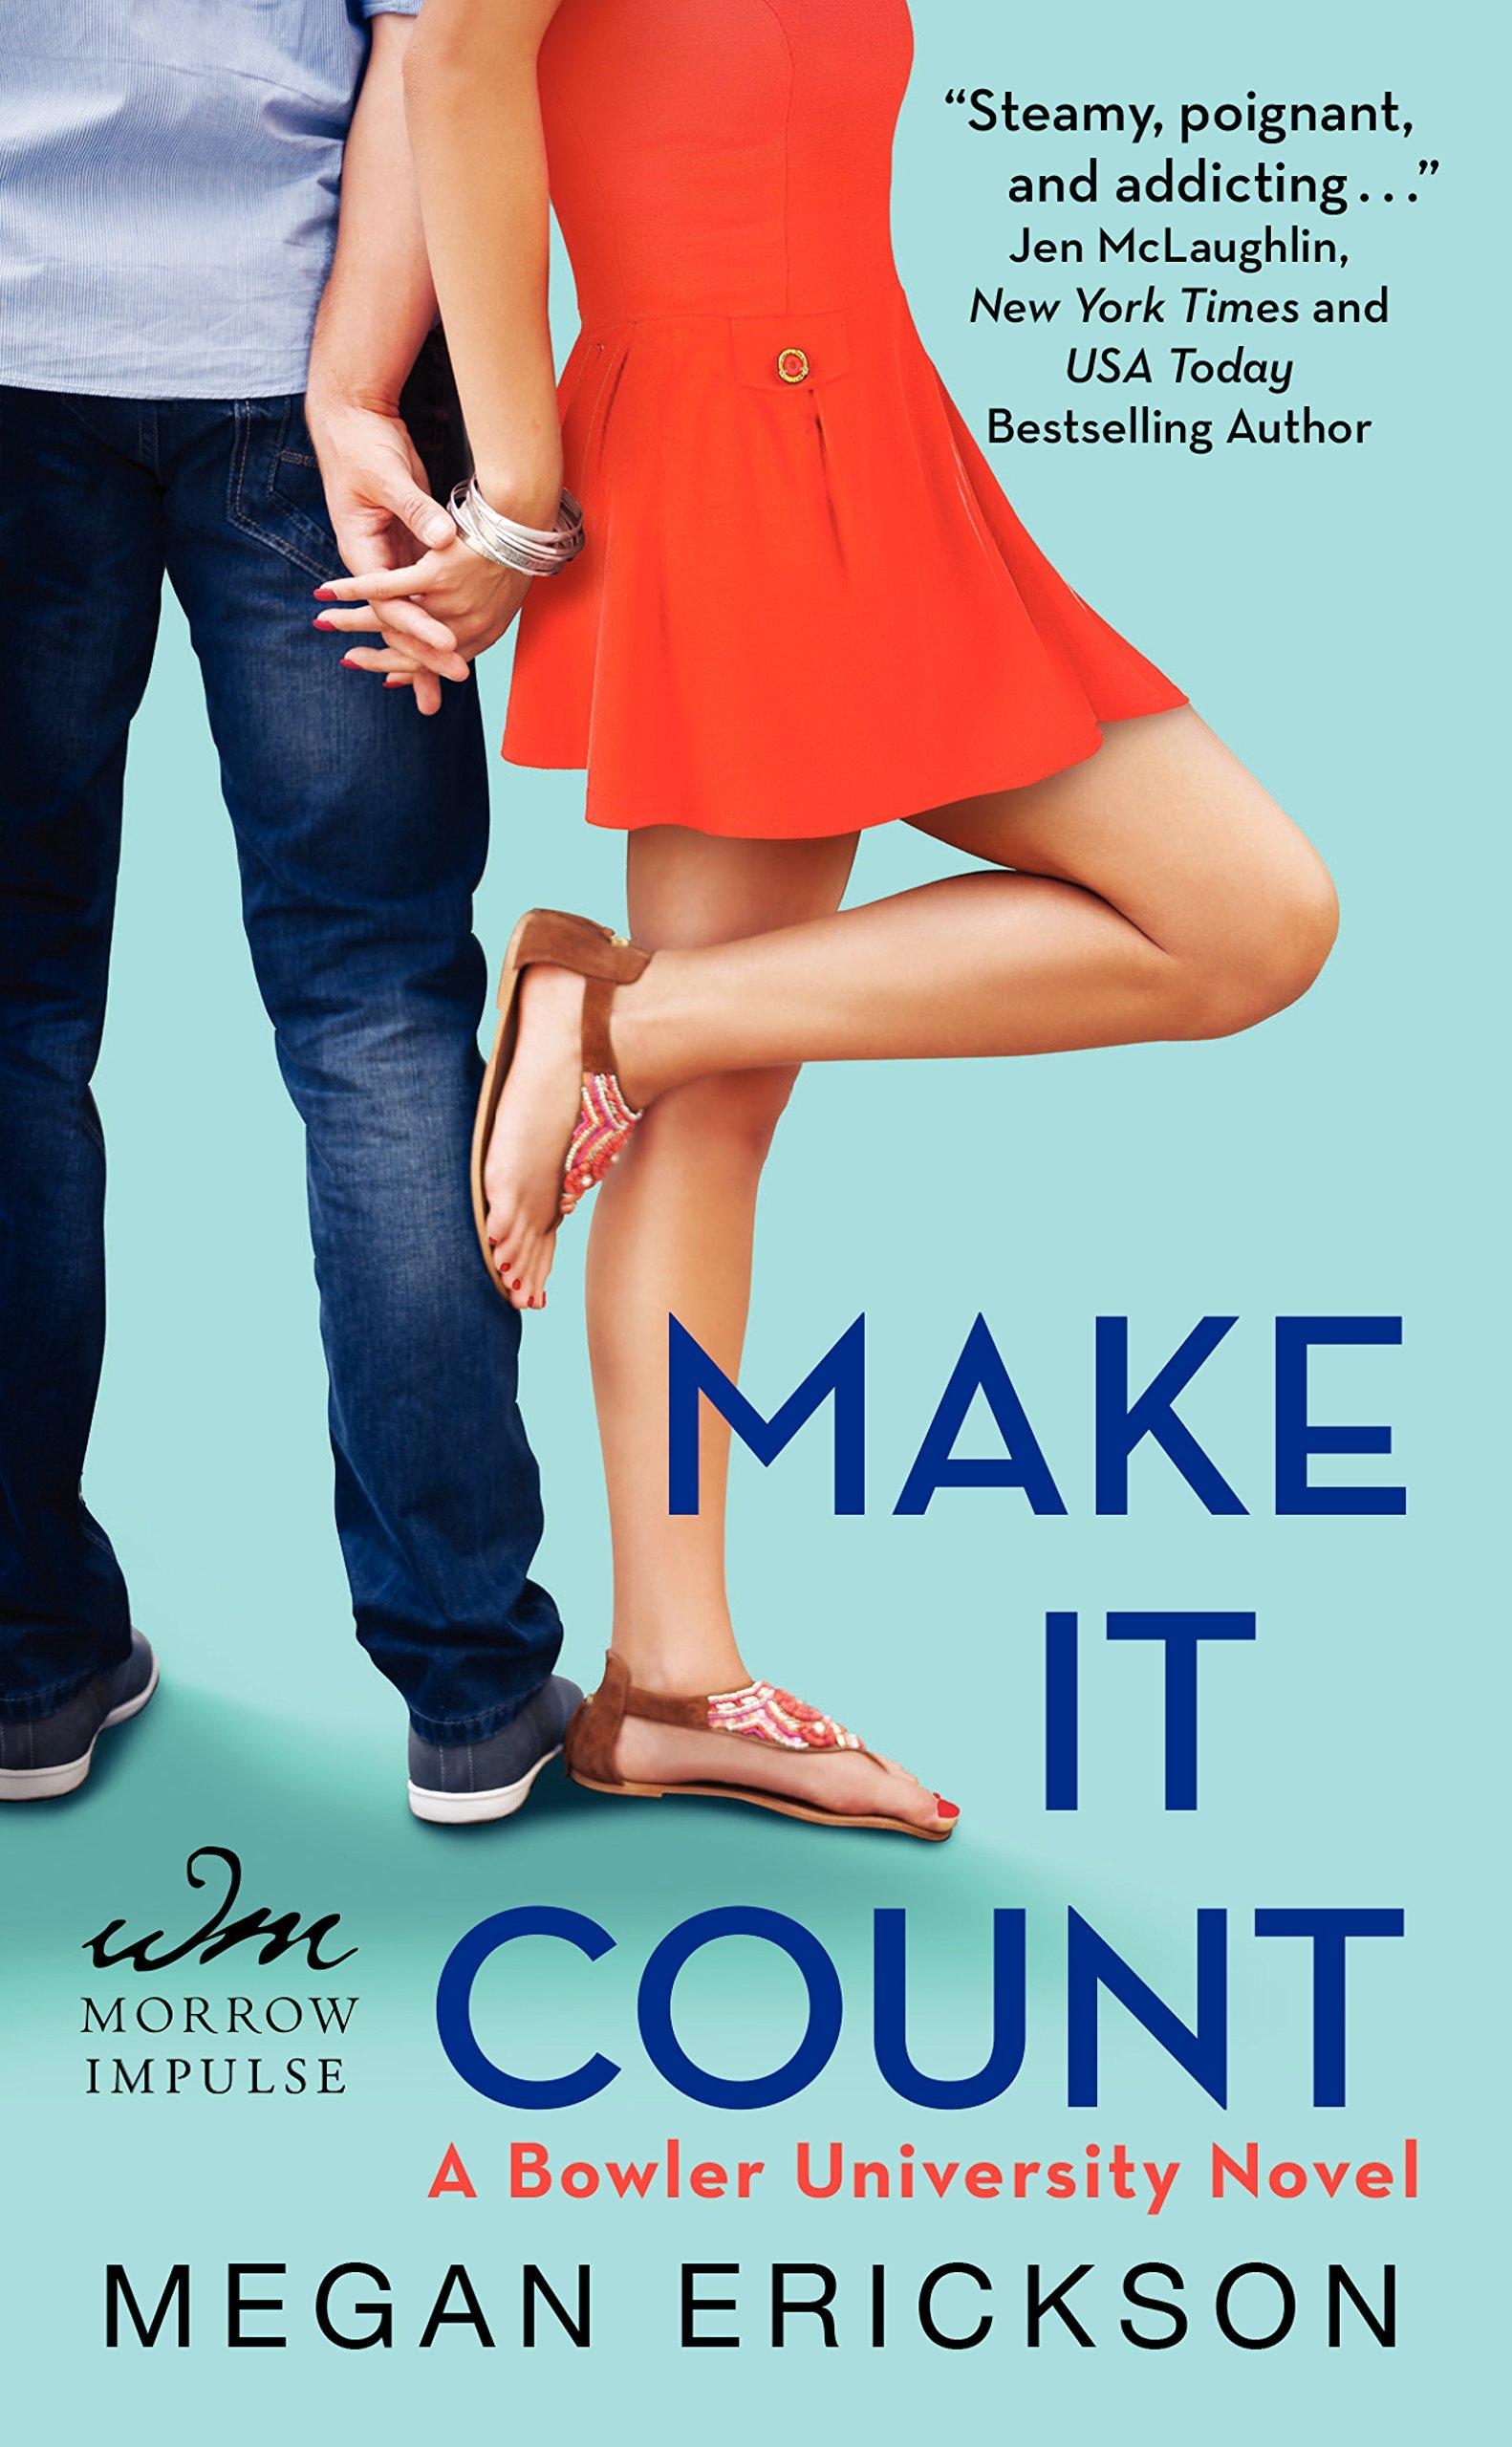 ERICKSON Megan - BROWLER UNIVERSITY tome 1 : Make it count 81%2BOGsElJ4L